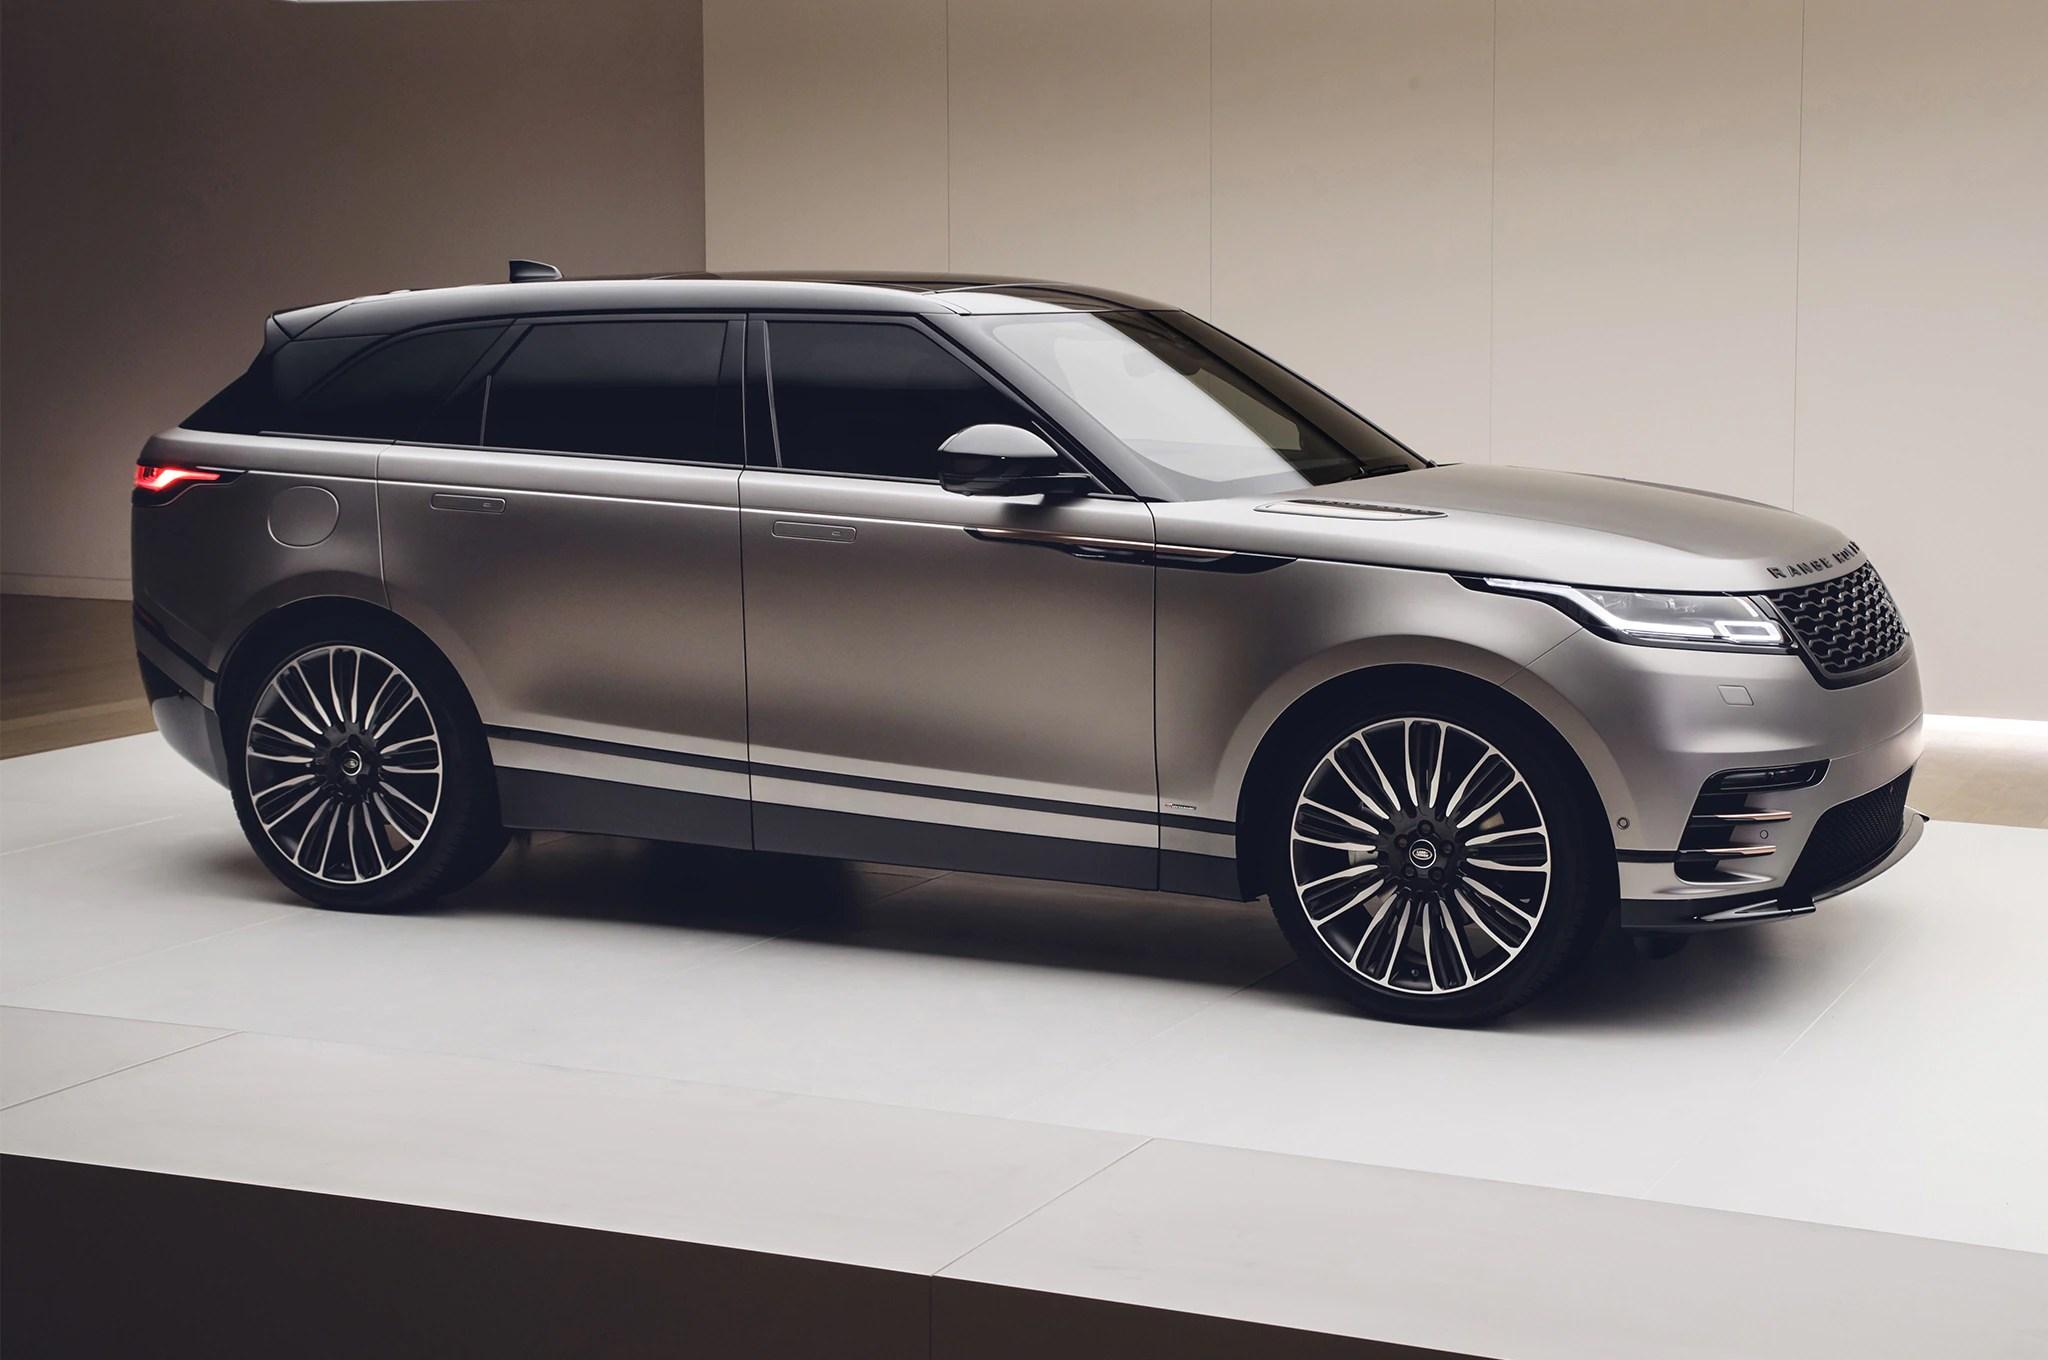 First Look 2018 Range Rover Velar